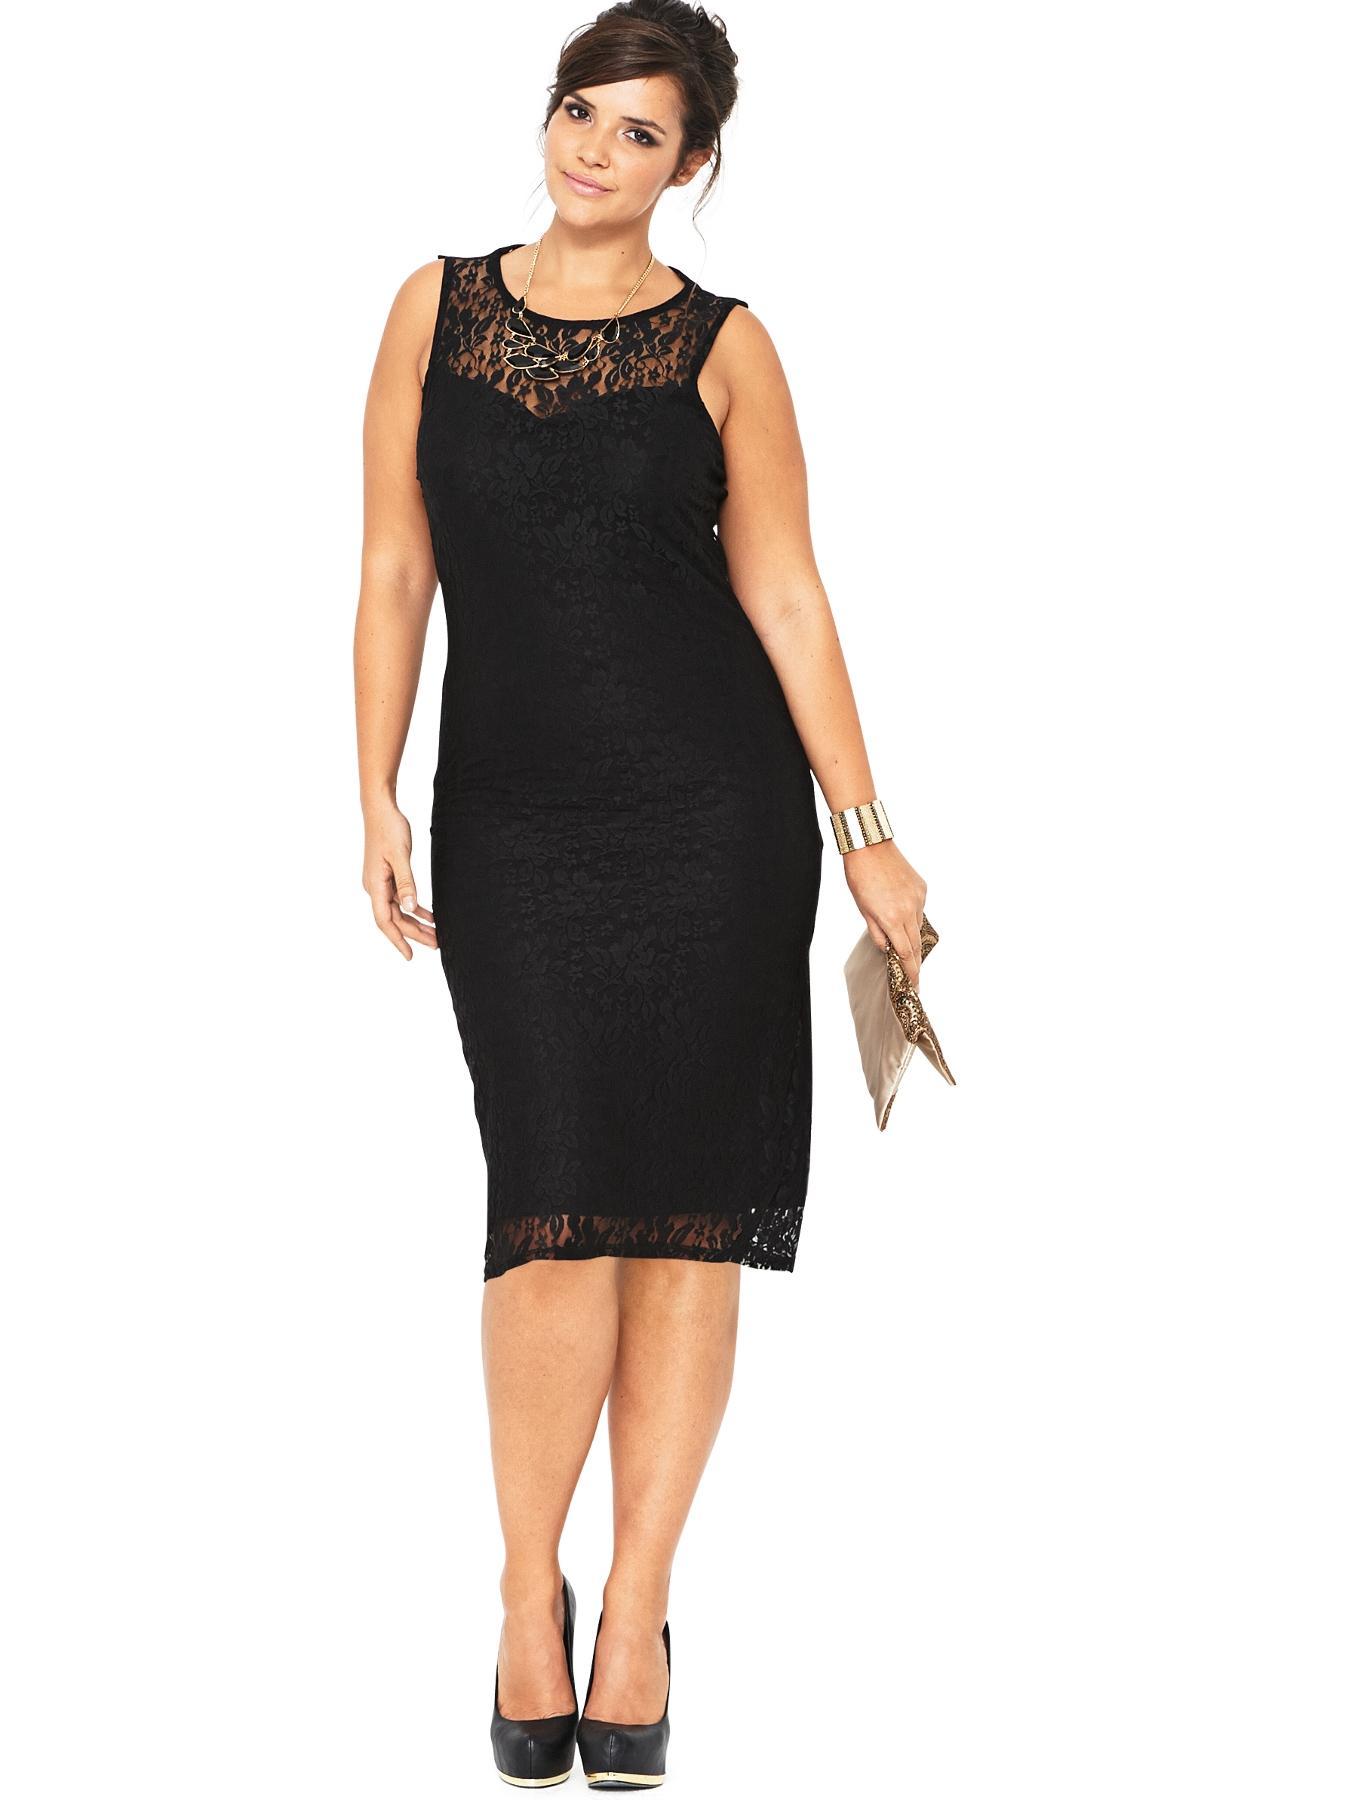 Black Lace Dress Size 14_Other dresses_dressesss